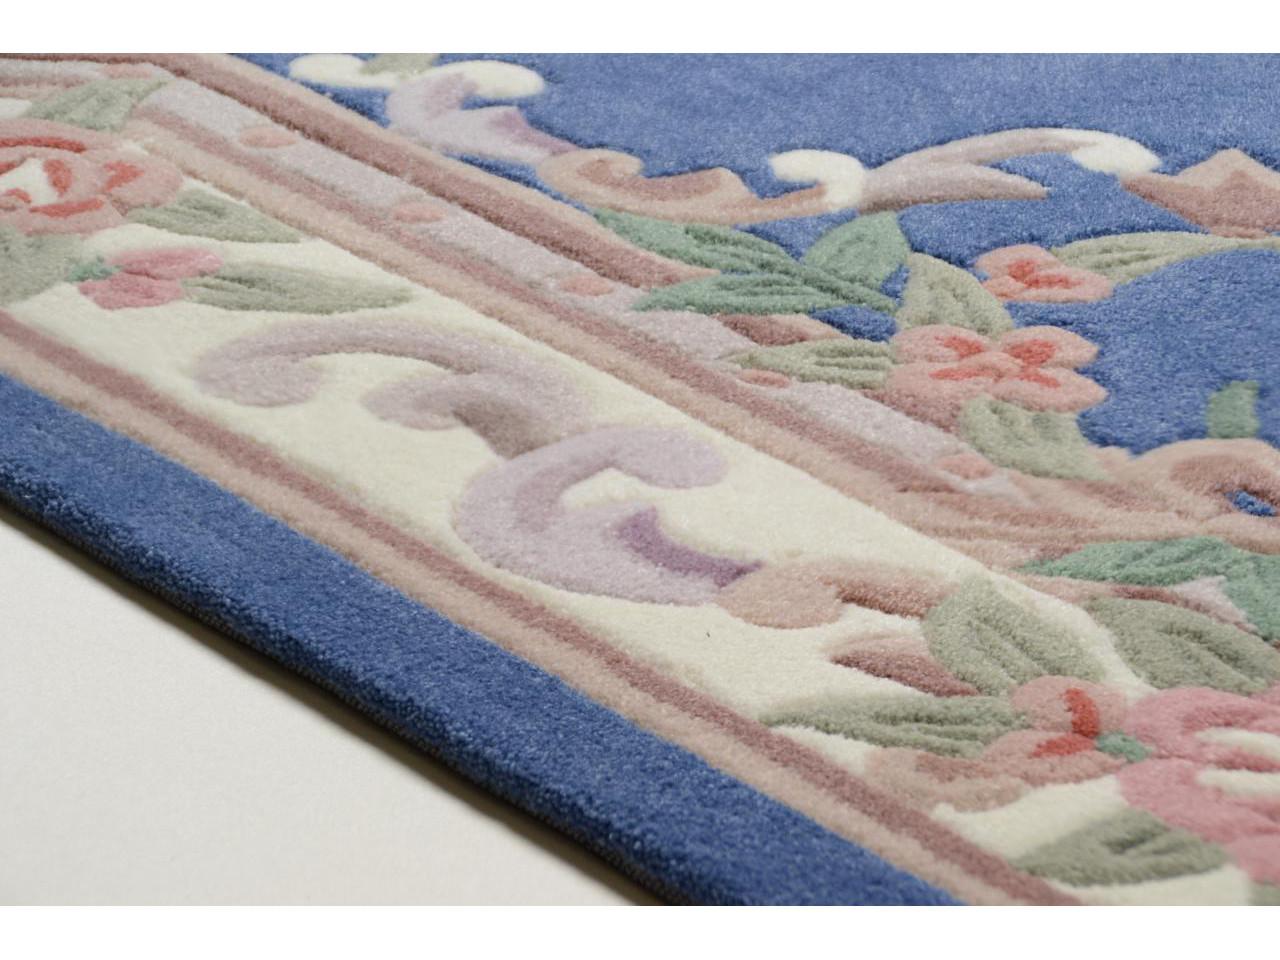 aubusson bleu tapis chinois n 32283 90x60cm. Black Bedroom Furniture Sets. Home Design Ideas